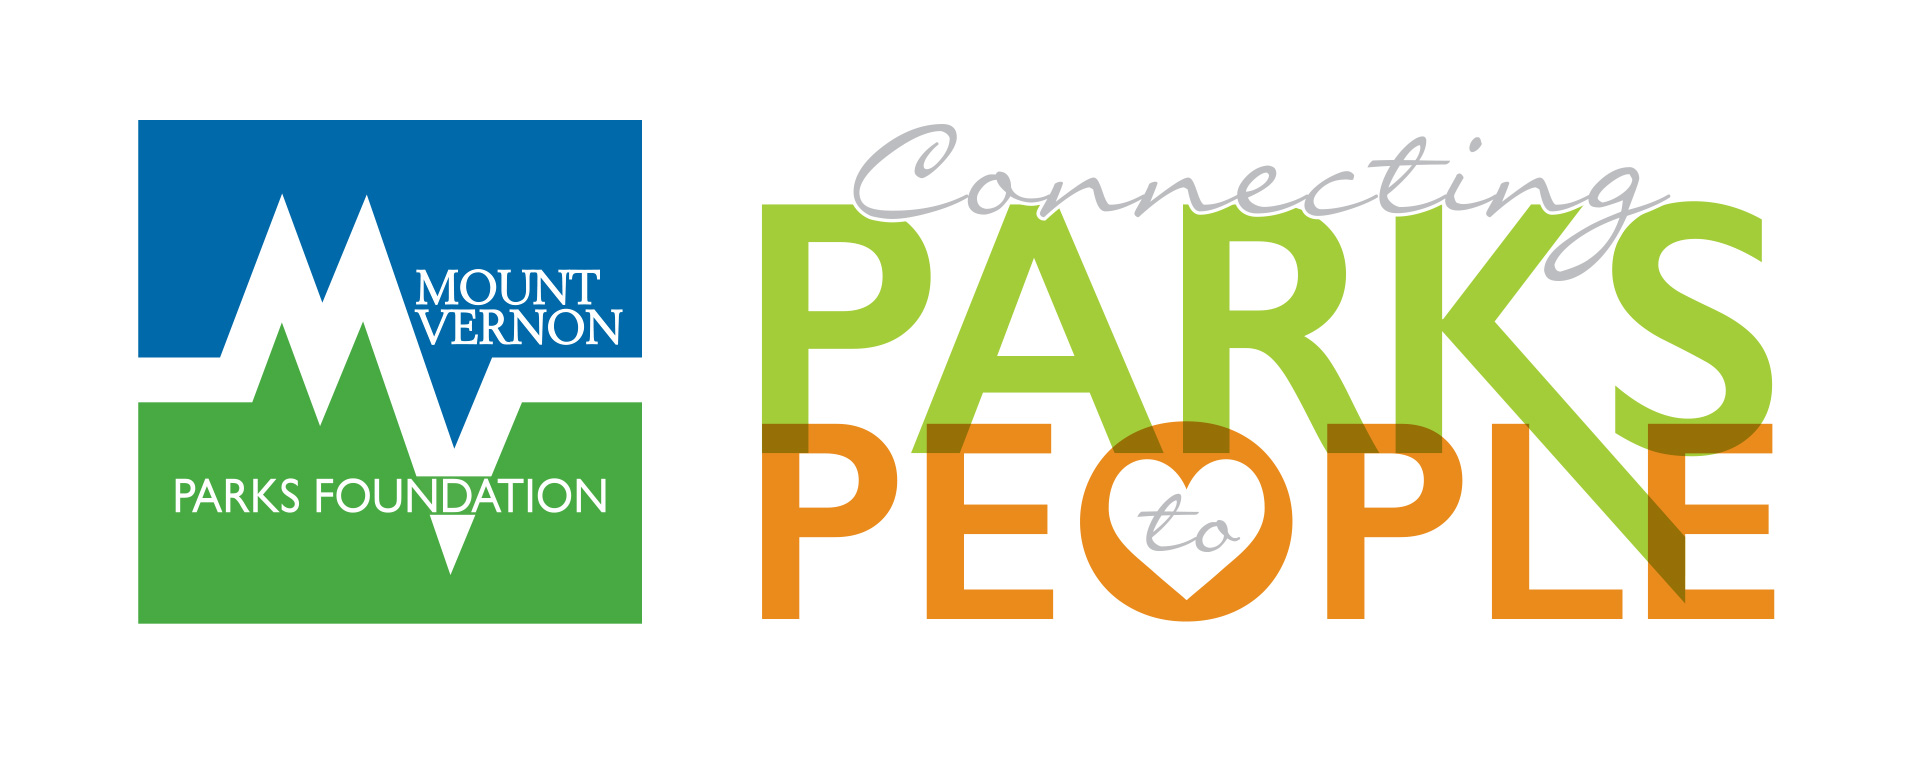 MVPF-P2P-logo.jpg